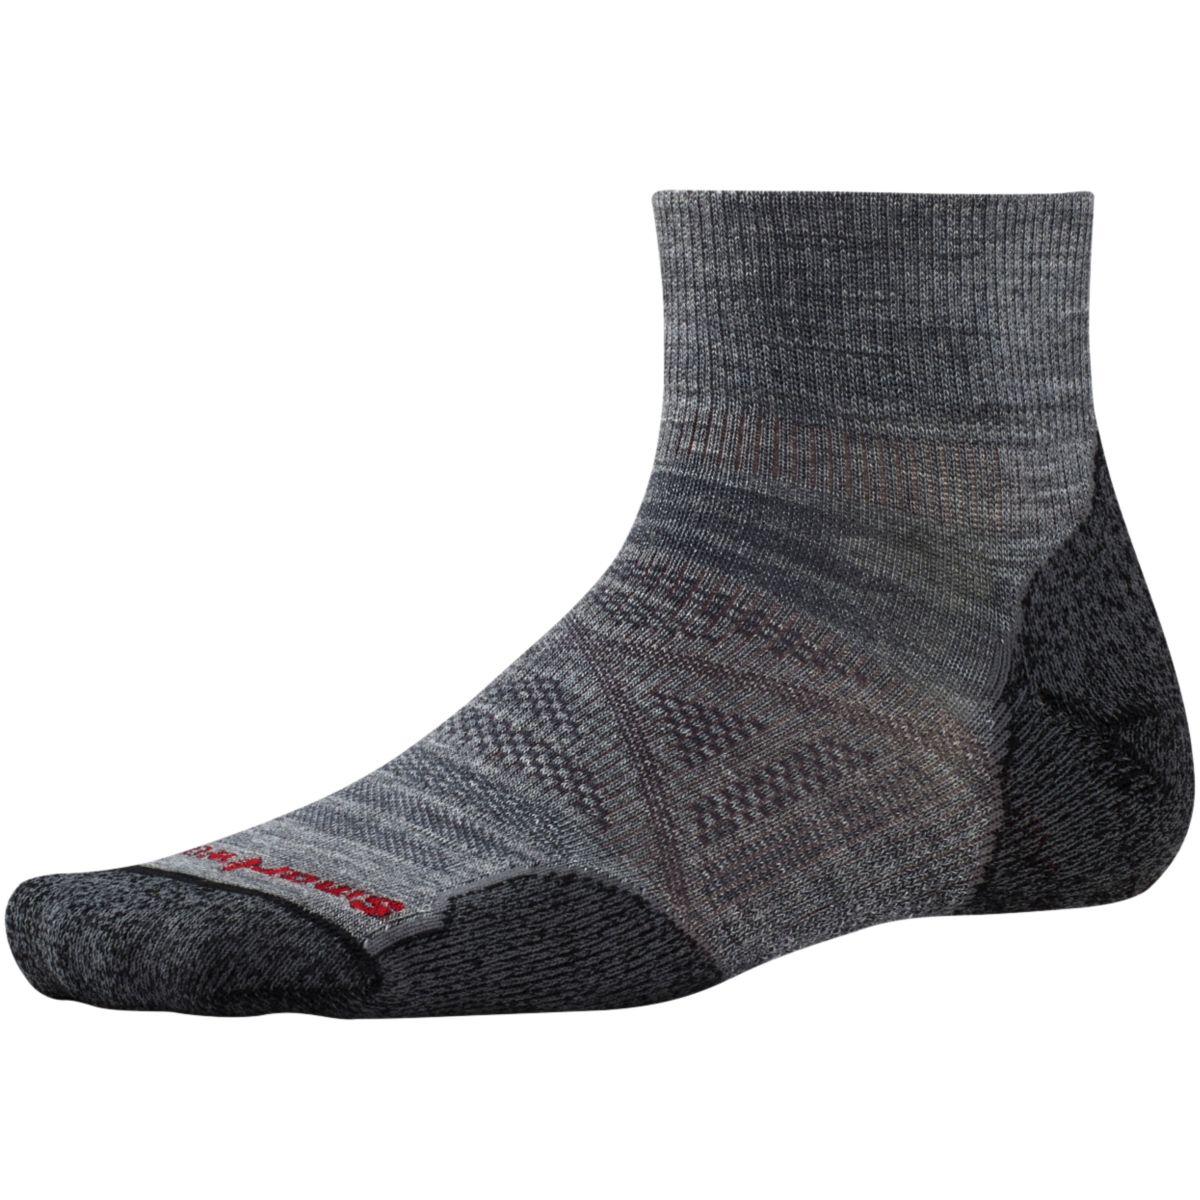 Smartwool Men's Phd Outdoor Light Mini Socks - Black, XL